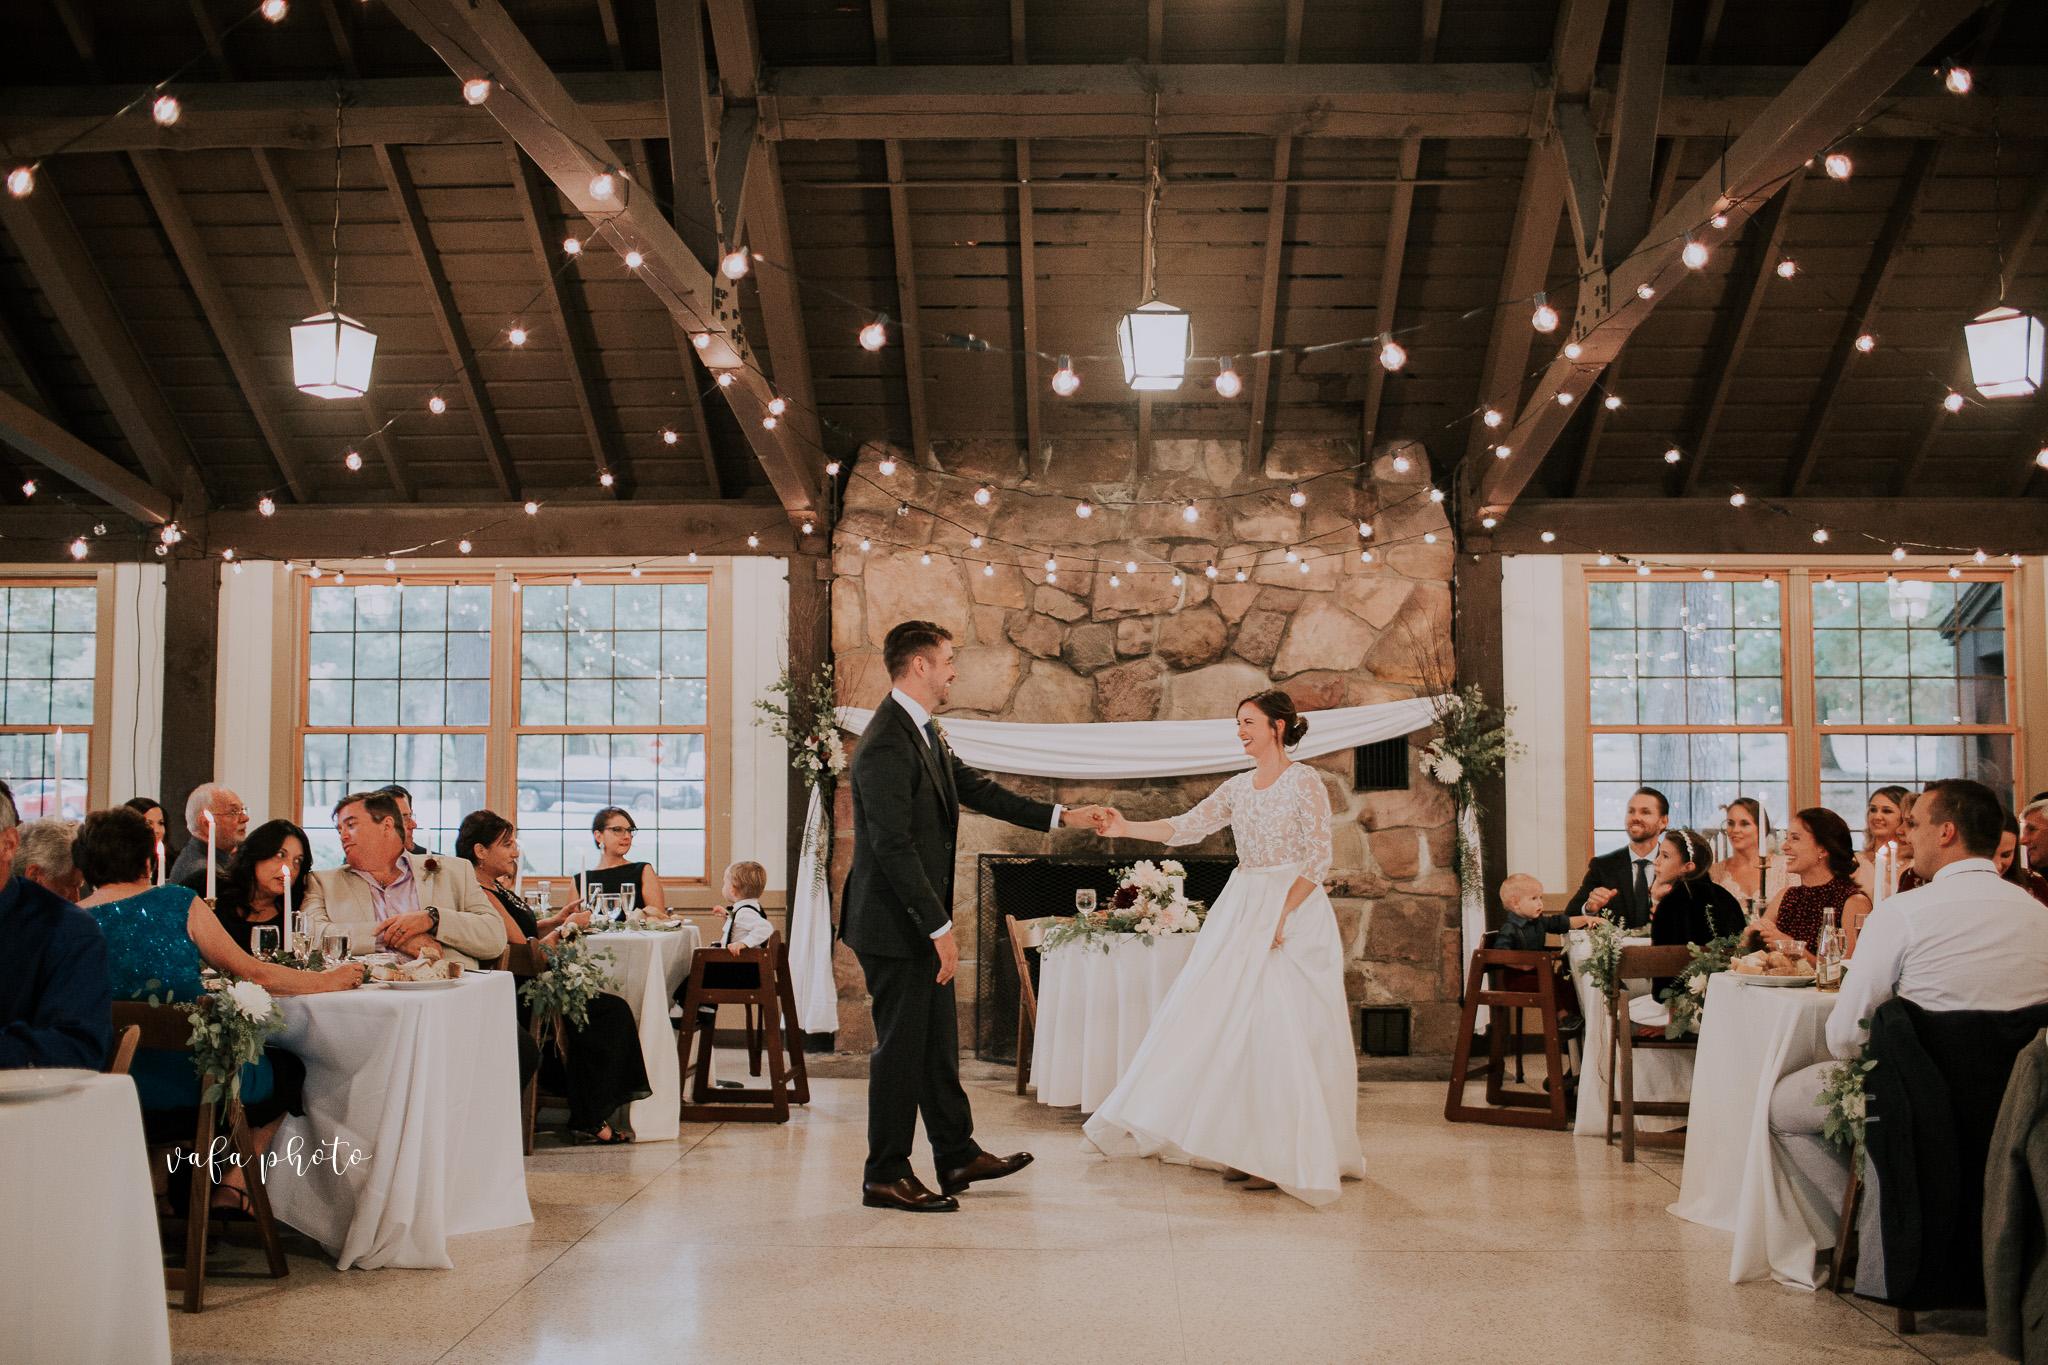 Grand-Rapids-Wedding-Danielle-Brian-Vafa-Photo-907.jpg